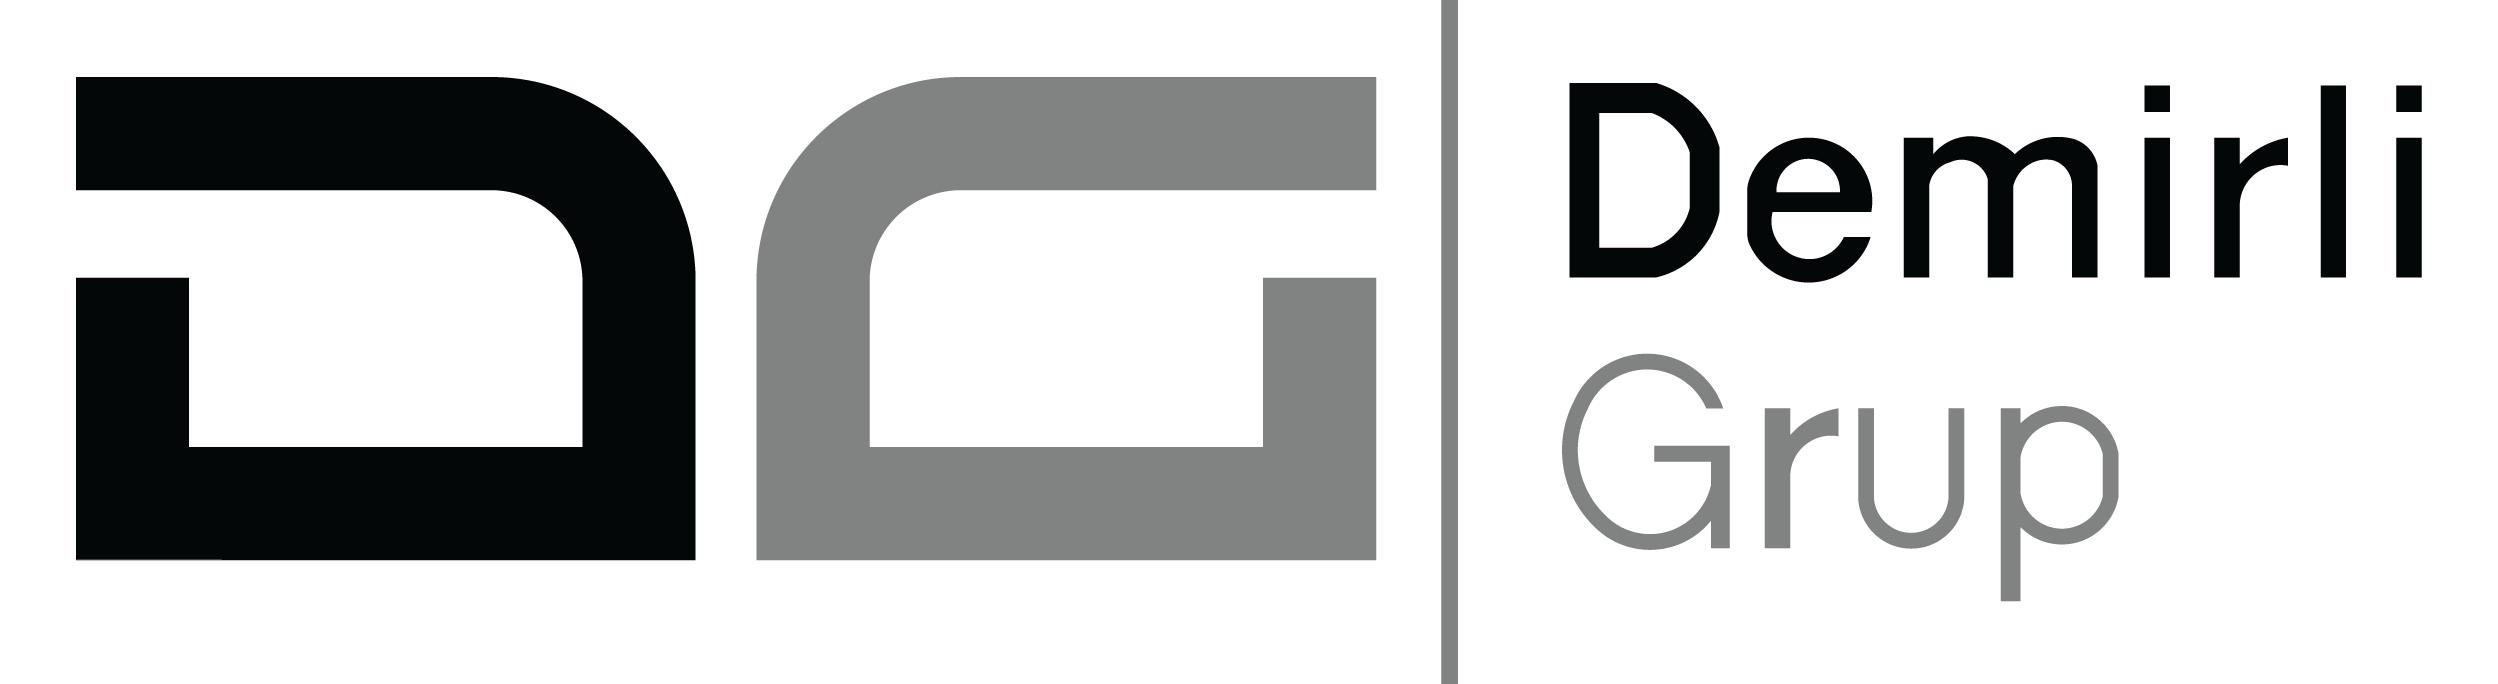 Demirli Grup || Konut Projeleri